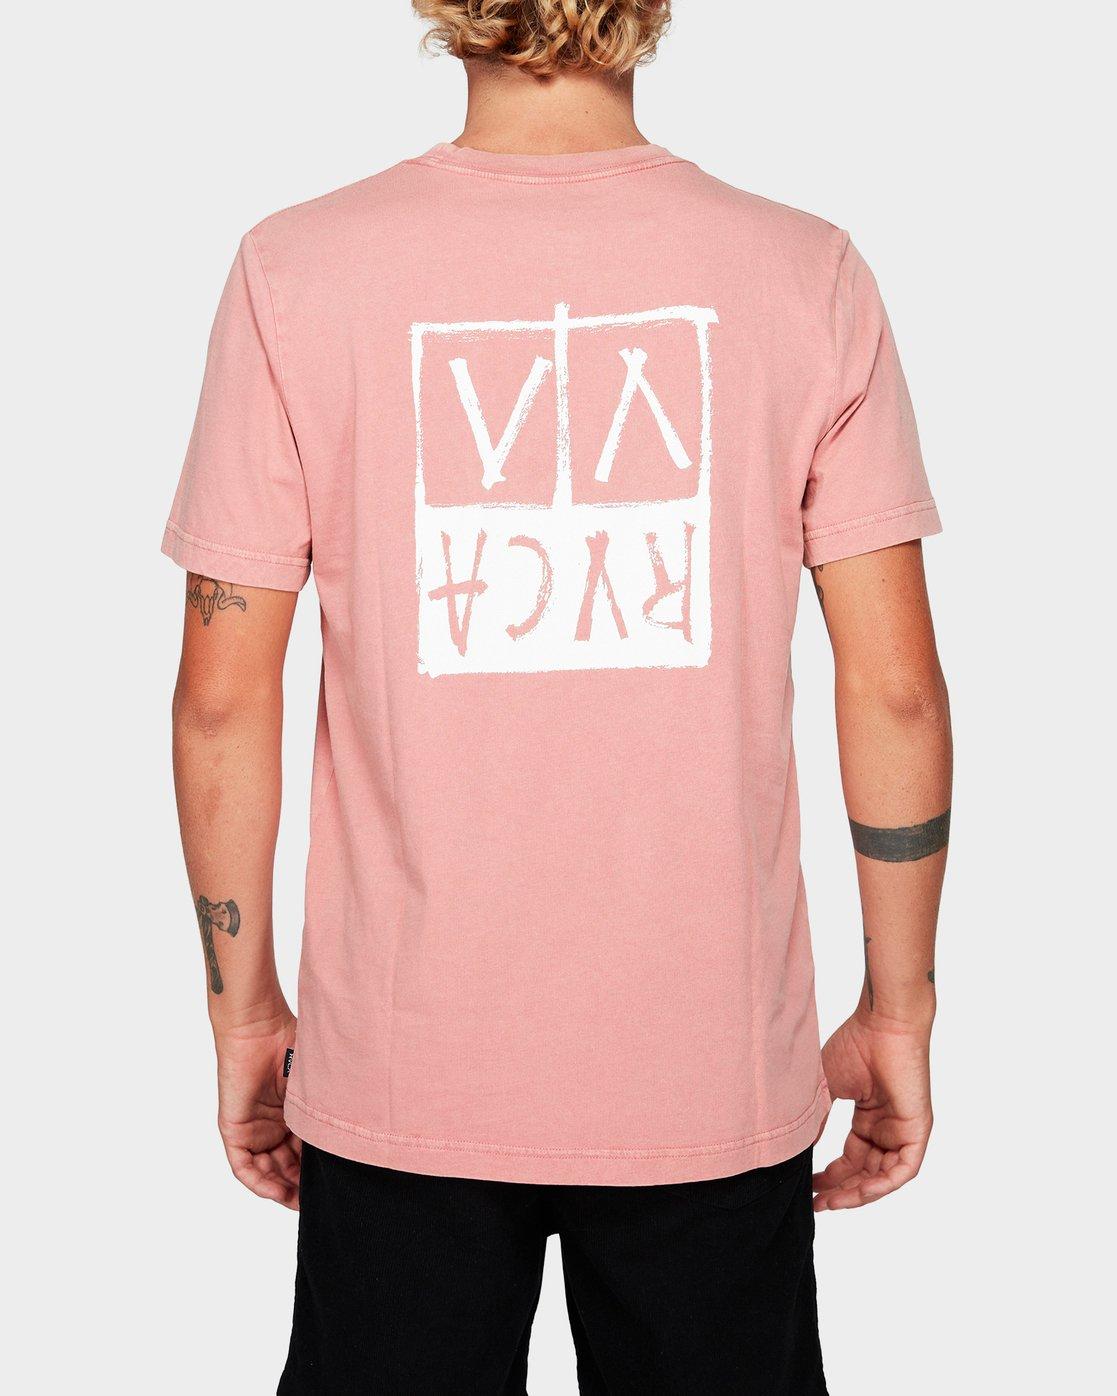 2 RVCA Unplugged Short Sleeve T-Shirt  R192041 RVCA